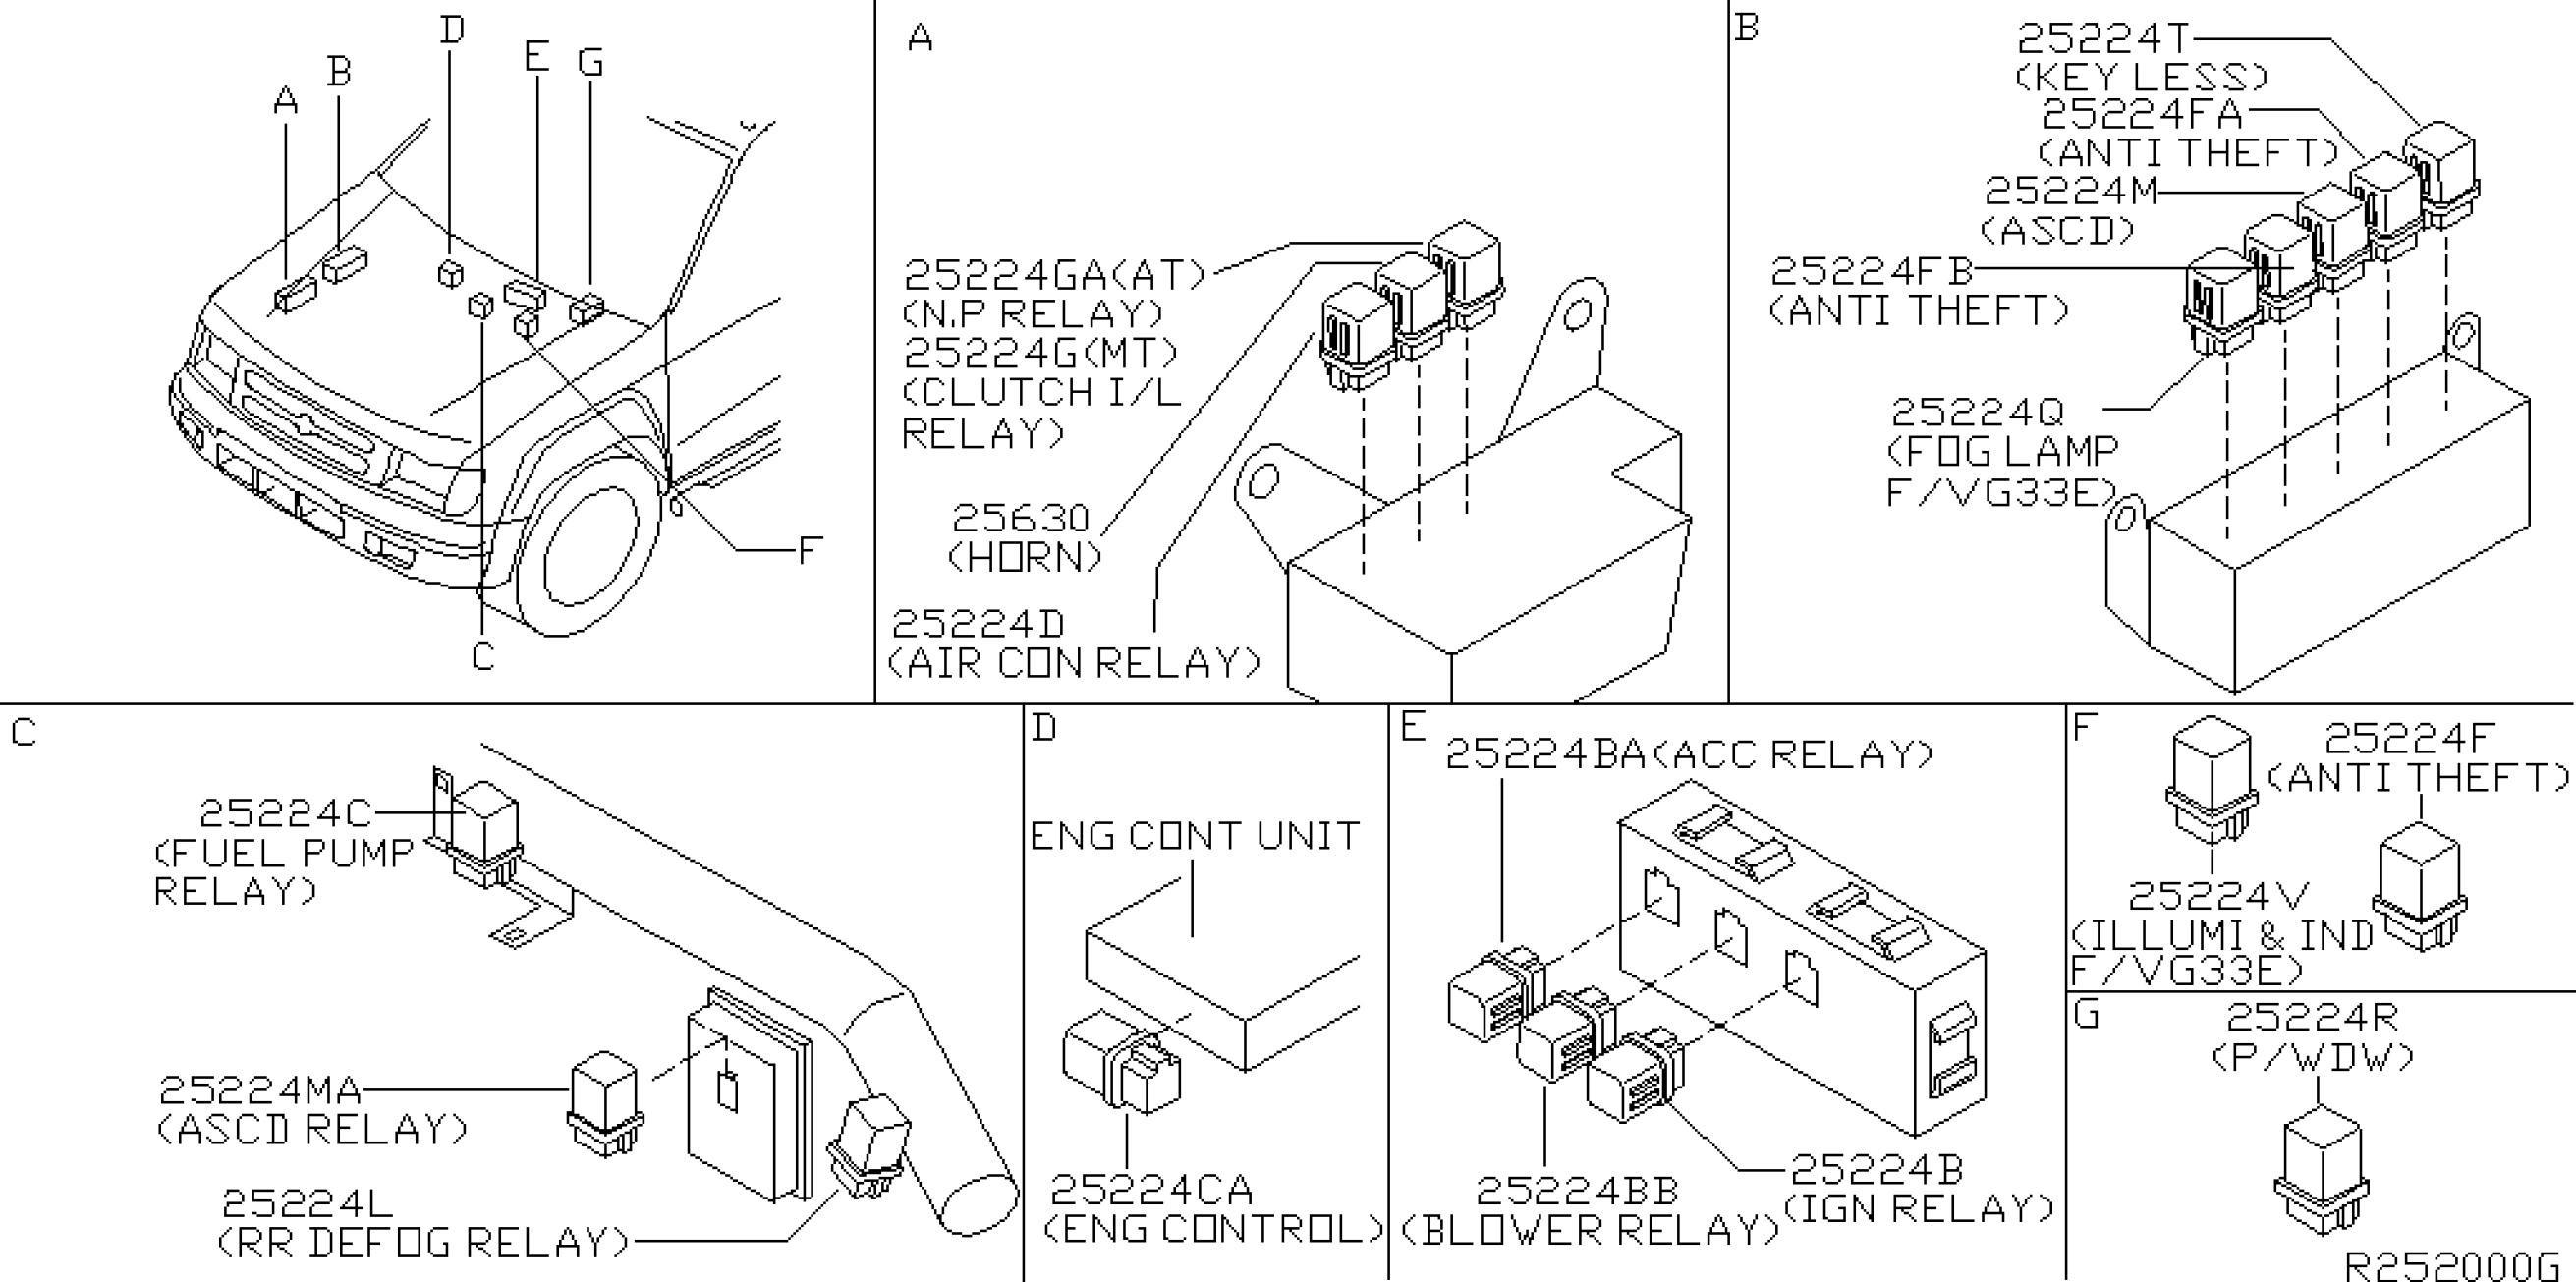 2003 Nissan Xterra Engine Diagram 2002 Nissan Xterra Oem Parts Nissan Usa Estore